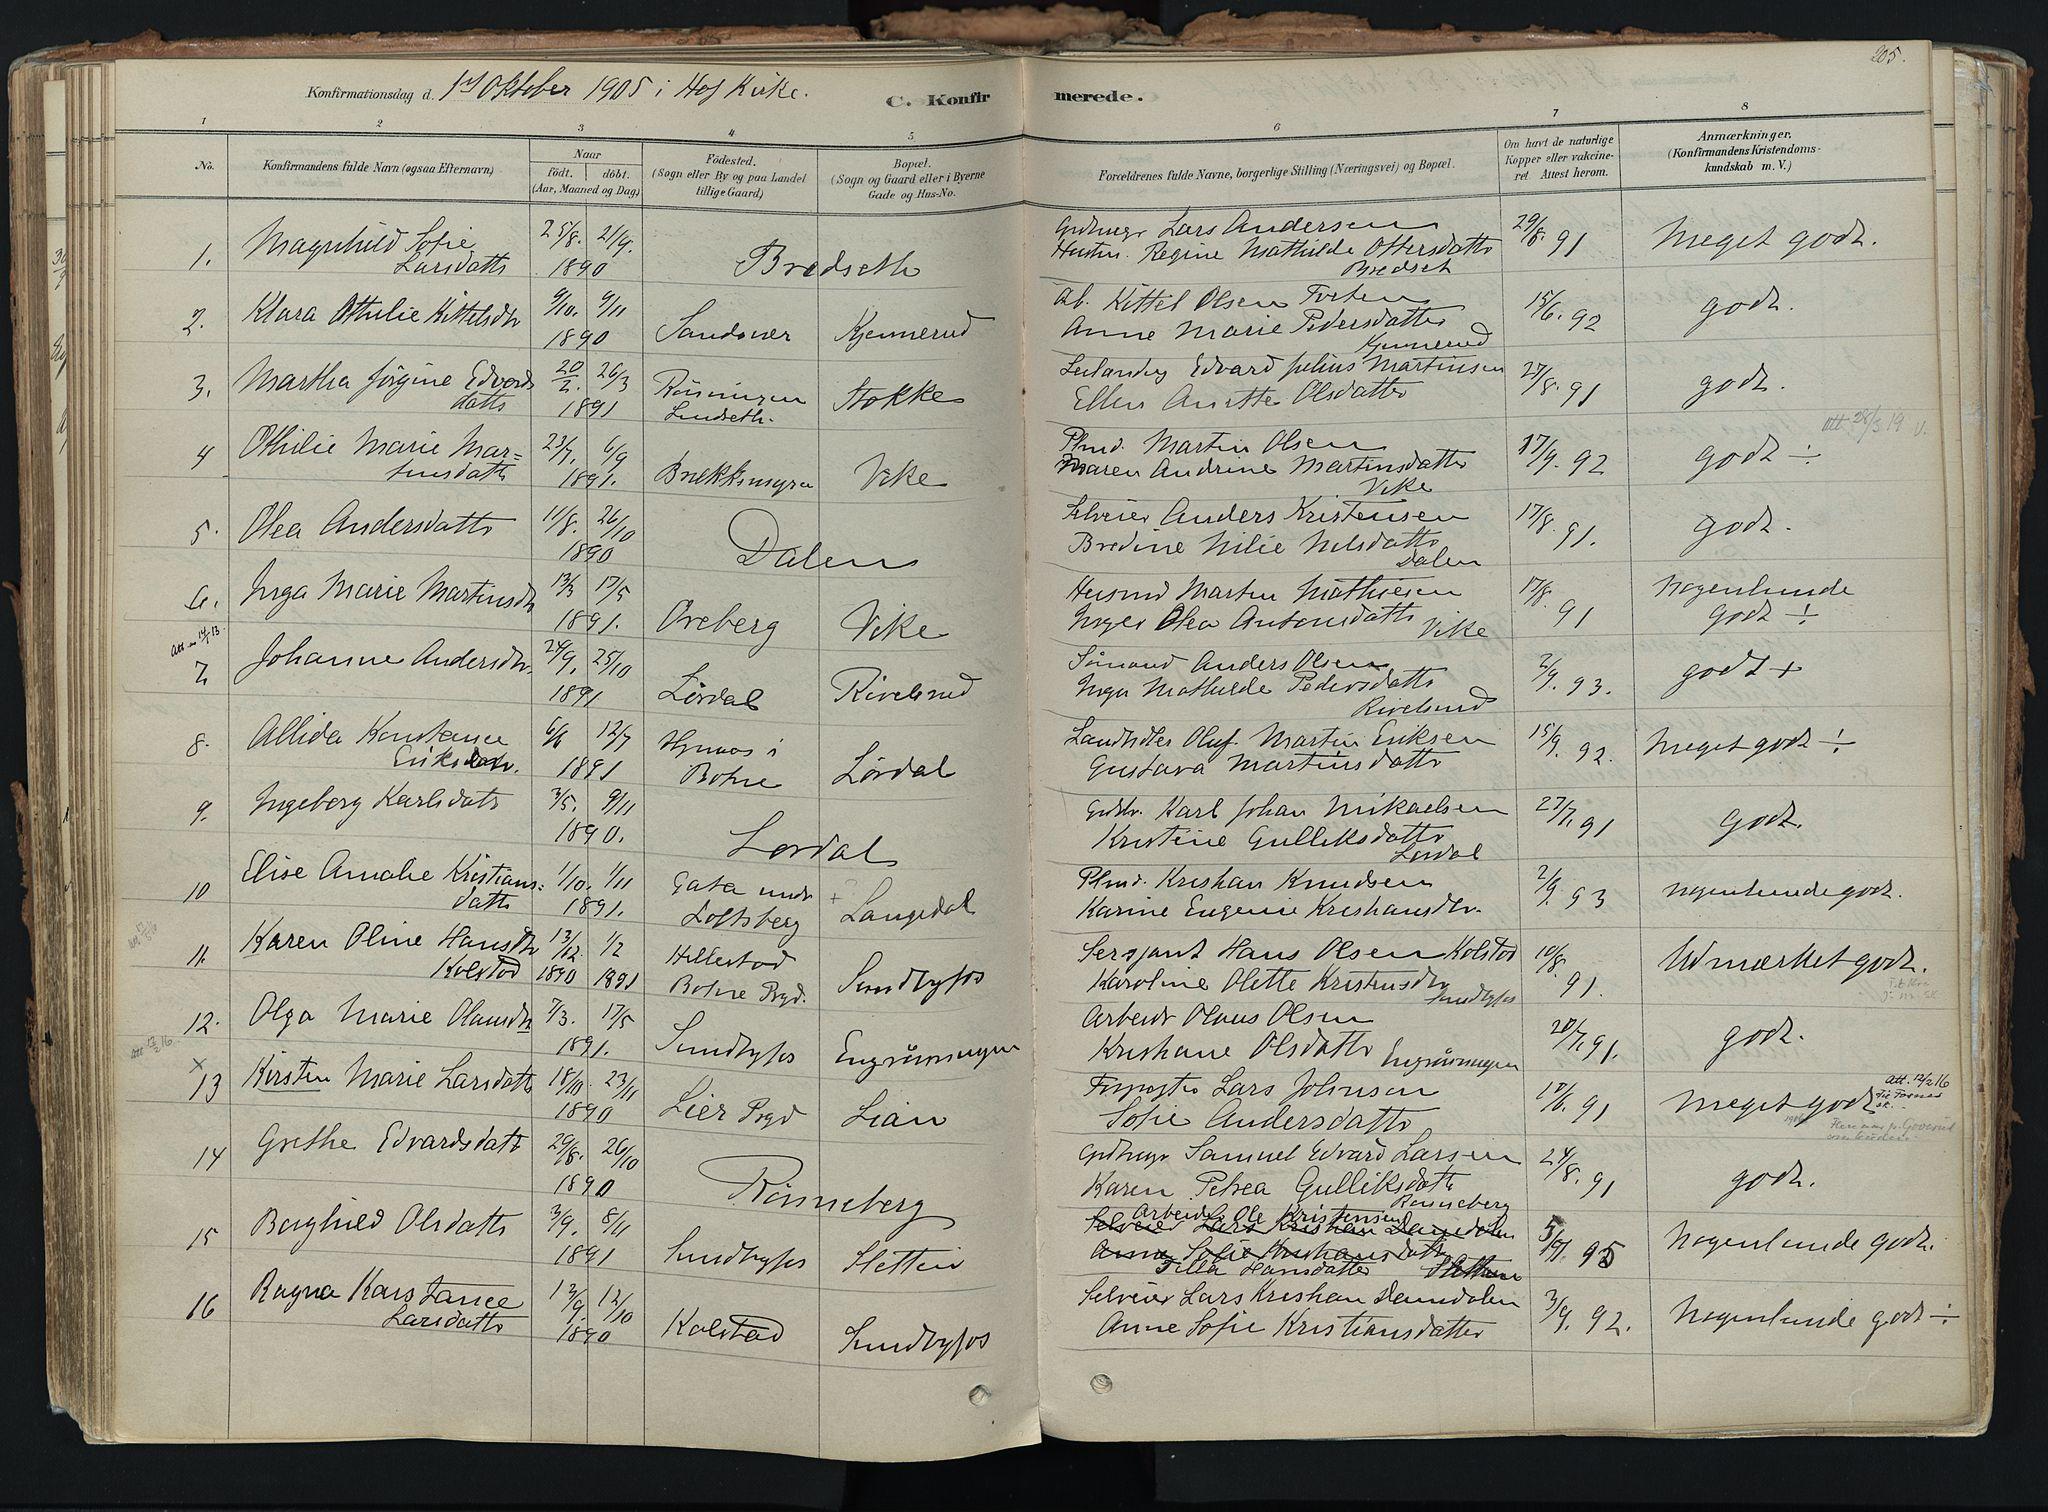 SAKO, Hof kirkebøker, F/Fa/L0007: Ministerialbok nr. I 7, 1878-1940, s. 205